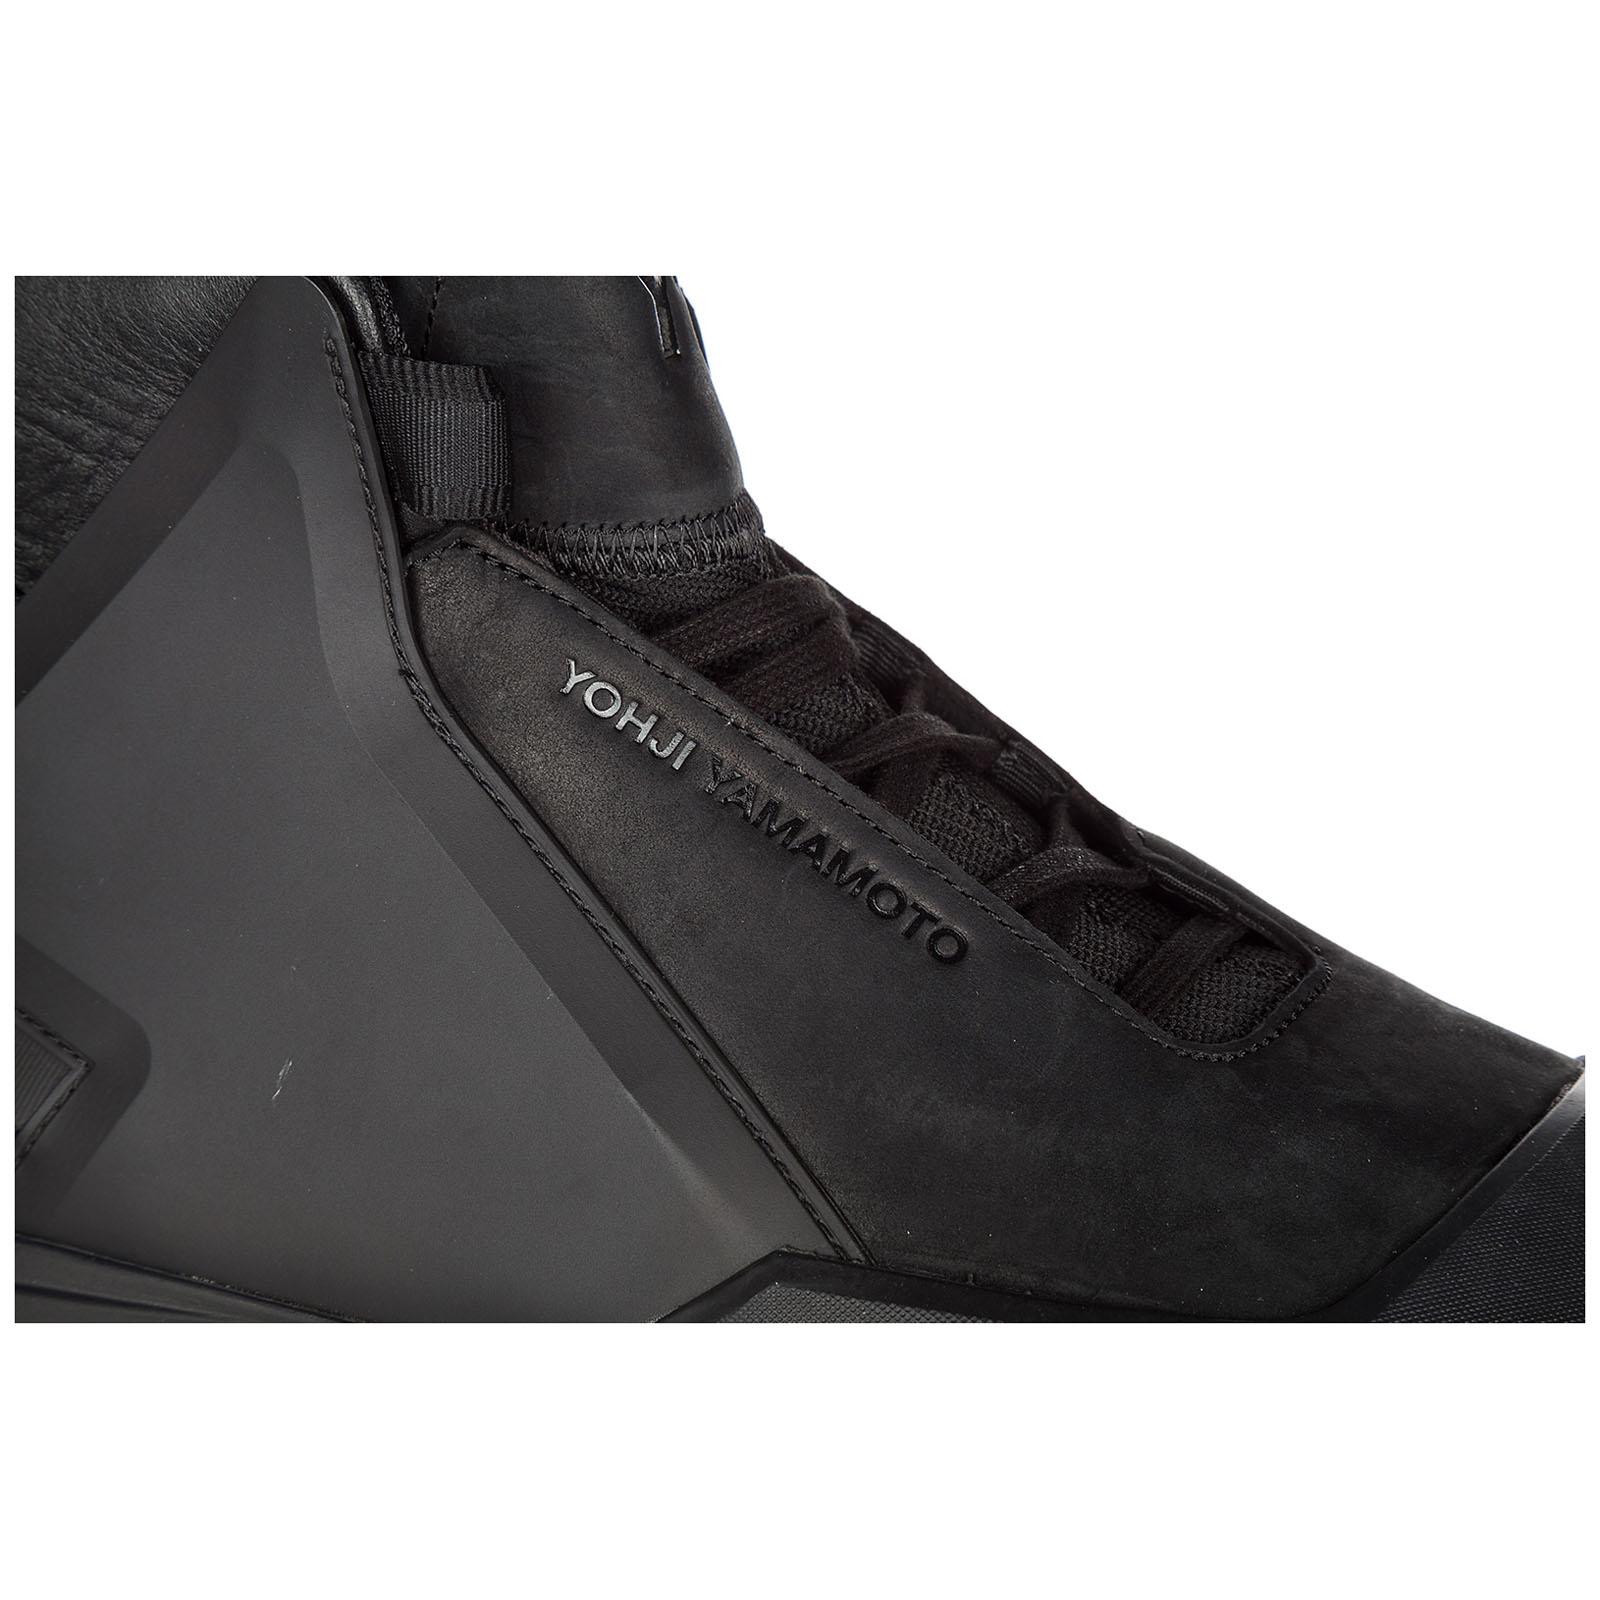 28edc028ae822 ... Men s shoes high top leather trainers sneakers yohji yamamoto bball tech